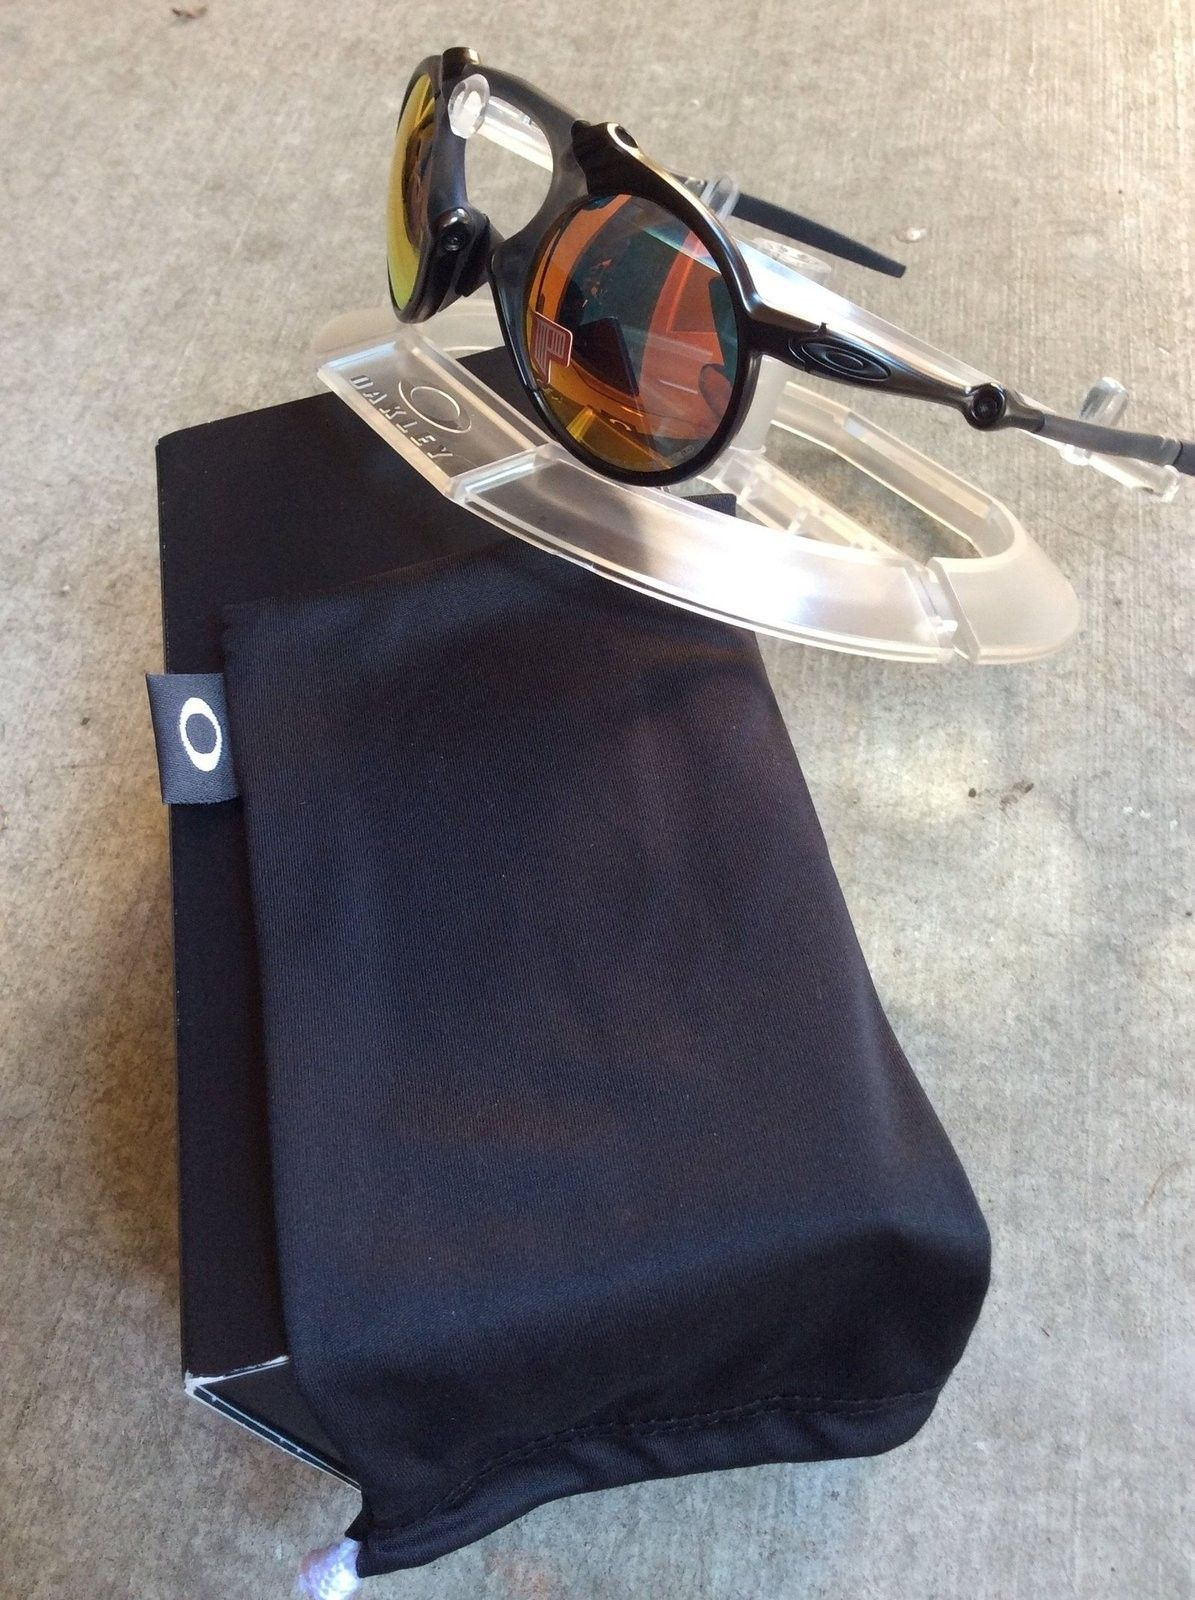 Oakley Madman $125 shipped - image.jpg